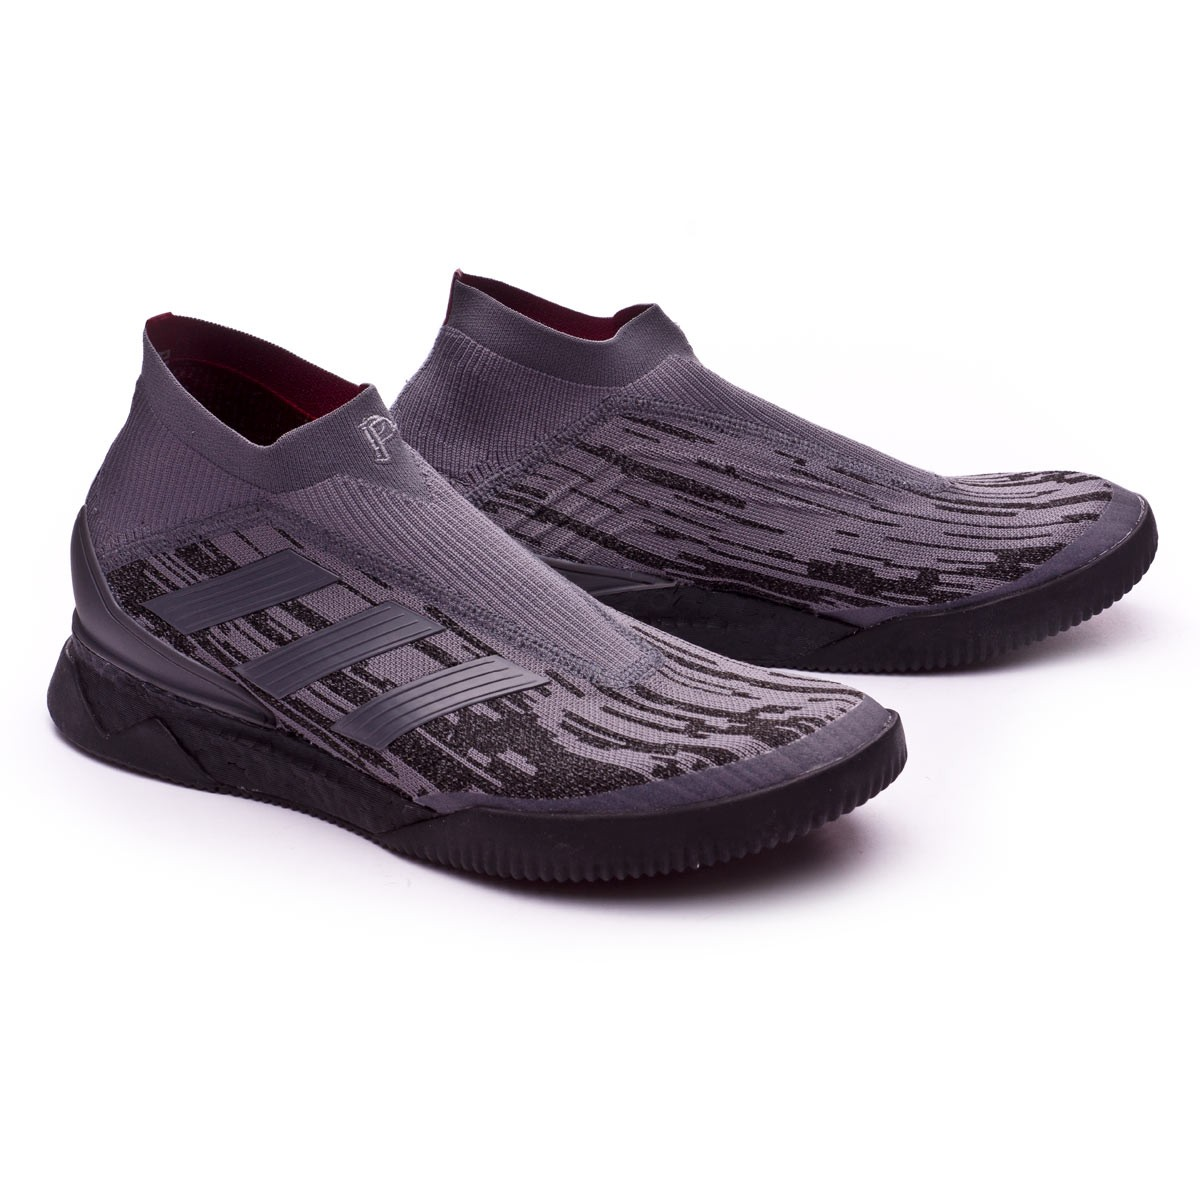 Pp Tango Adidas 18 Metallic Ultraboost Predator Zapatilla Tr 5tqT4z5R